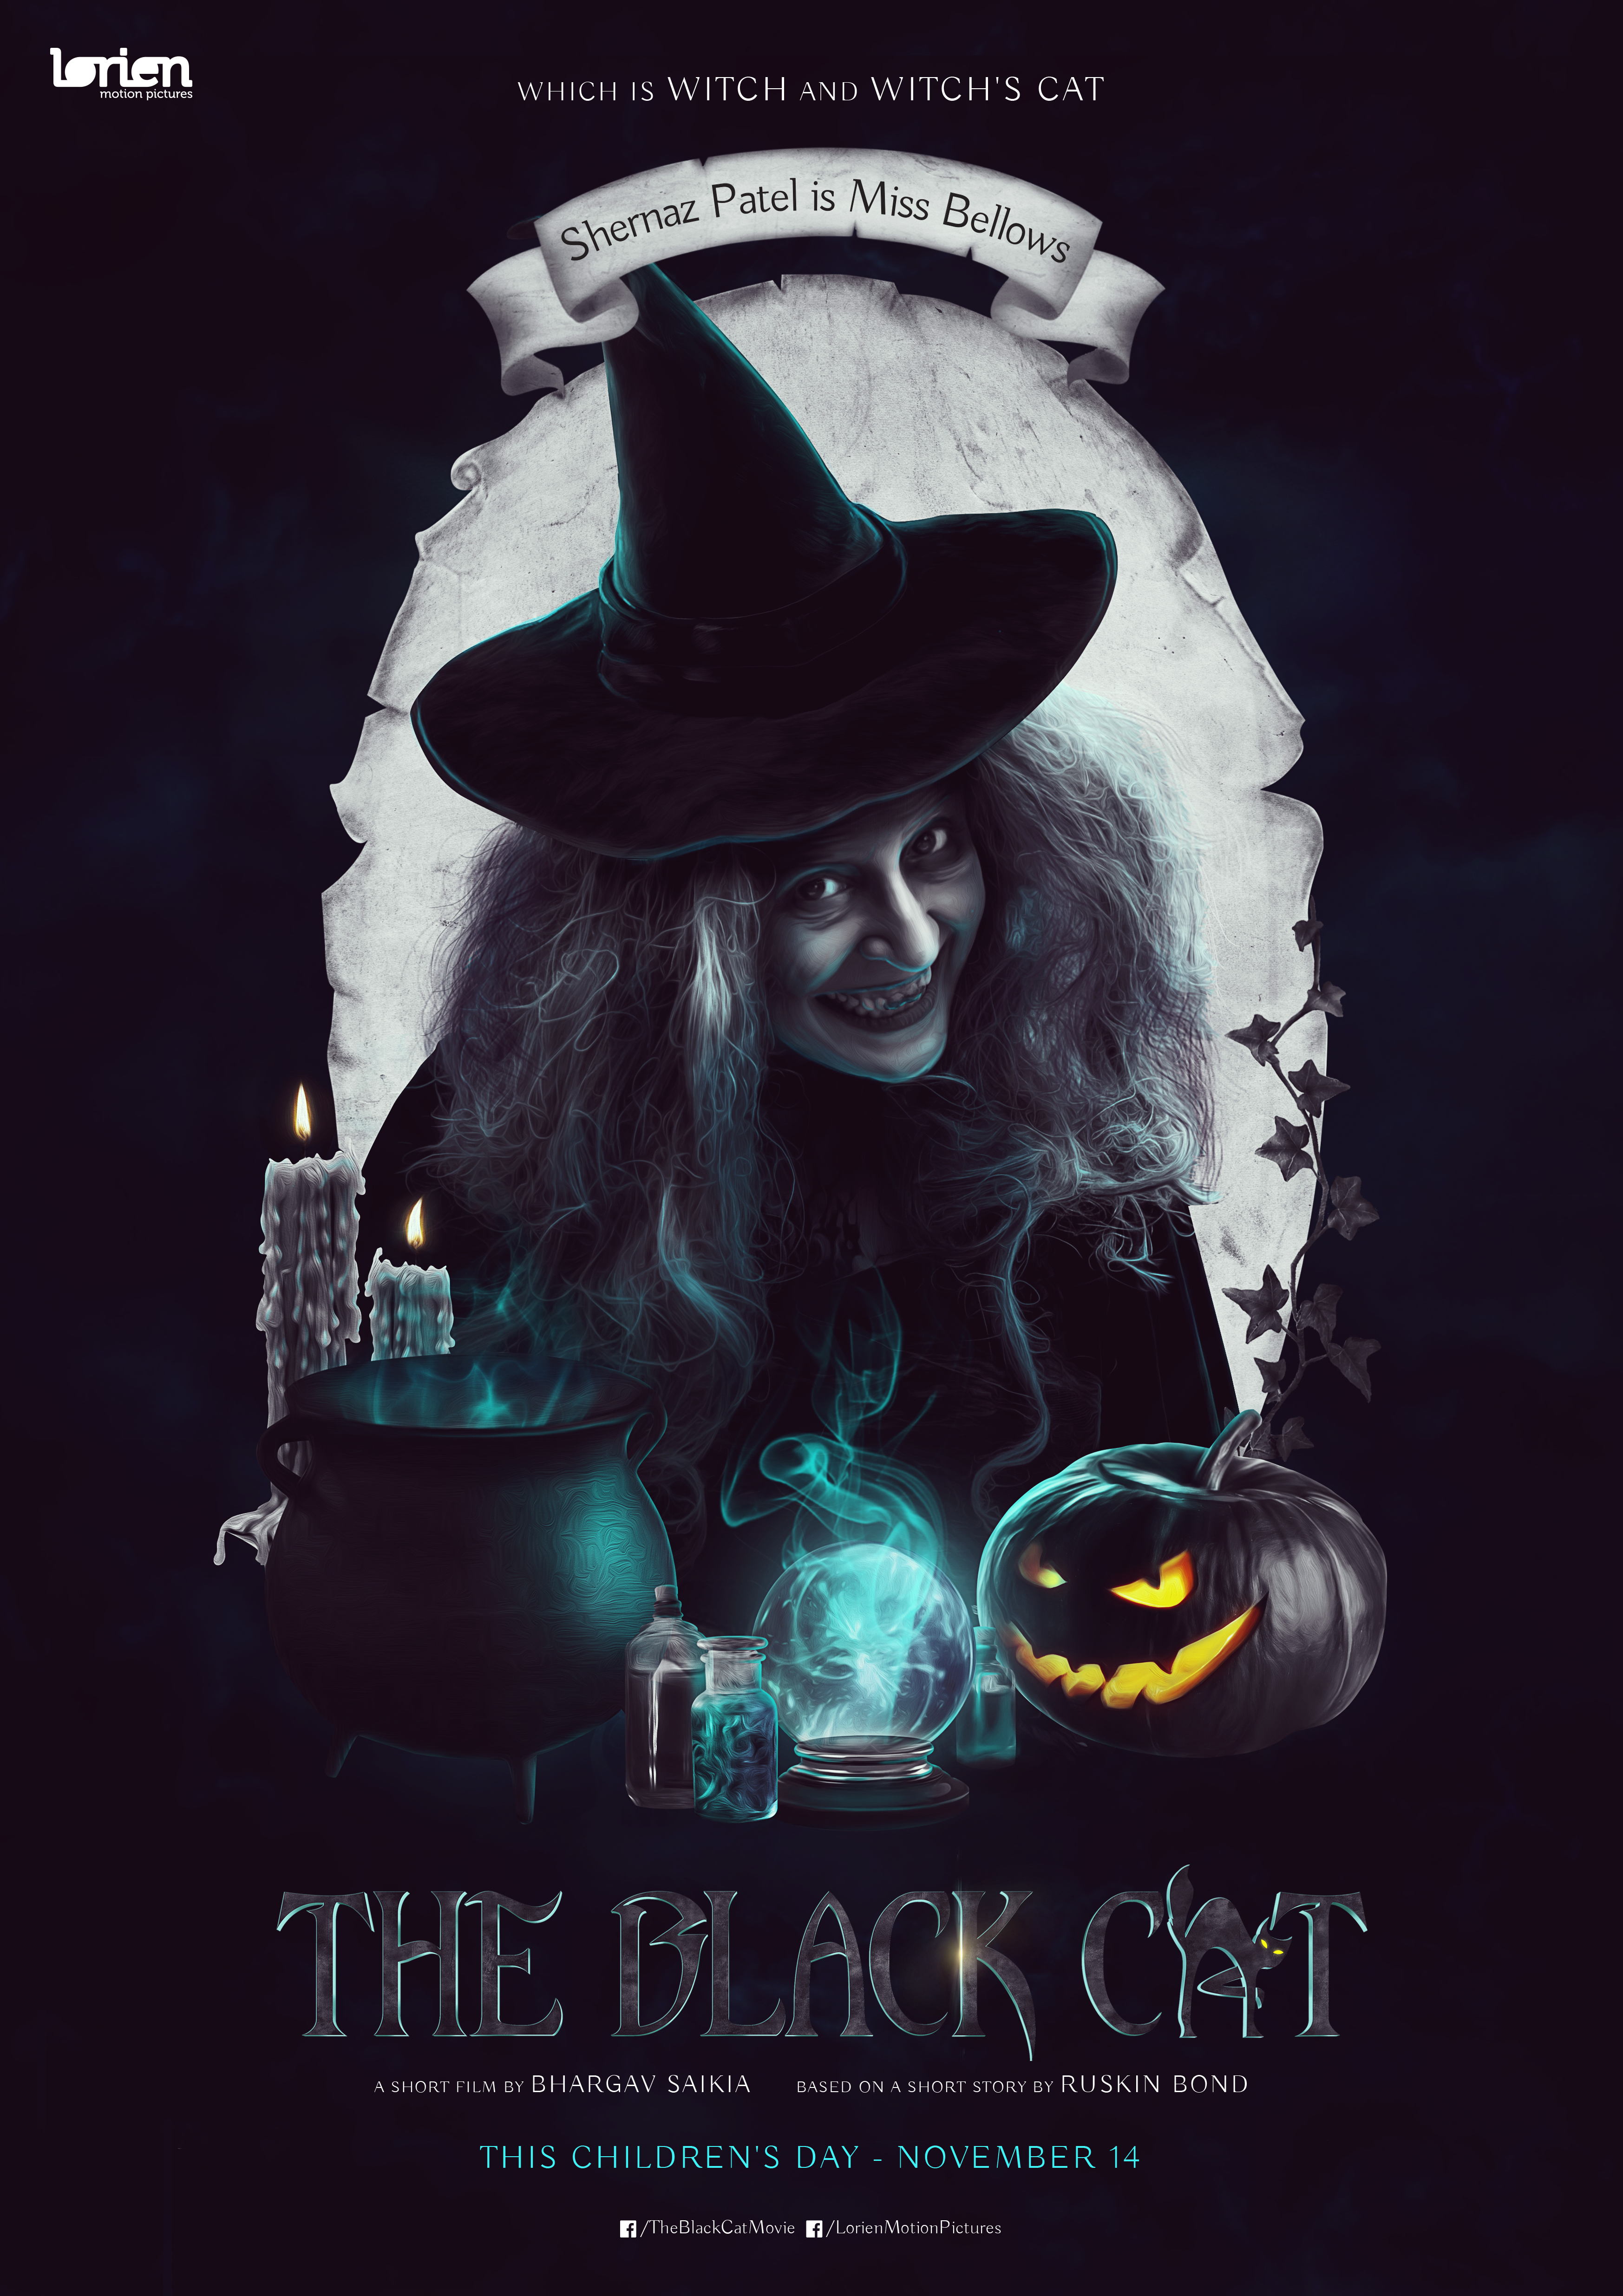 afcac611ff1 The Black Cat (2017) - IMDb